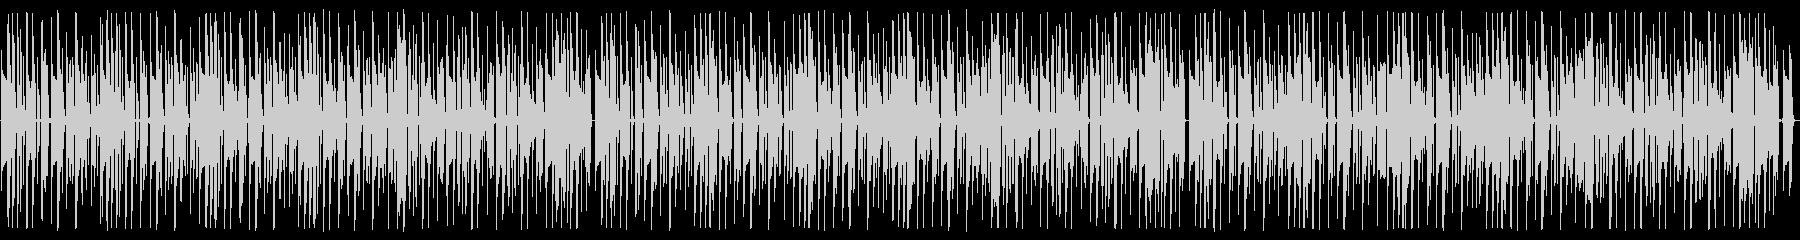 YouTube コミカルなピアノ・日常の未再生の波形